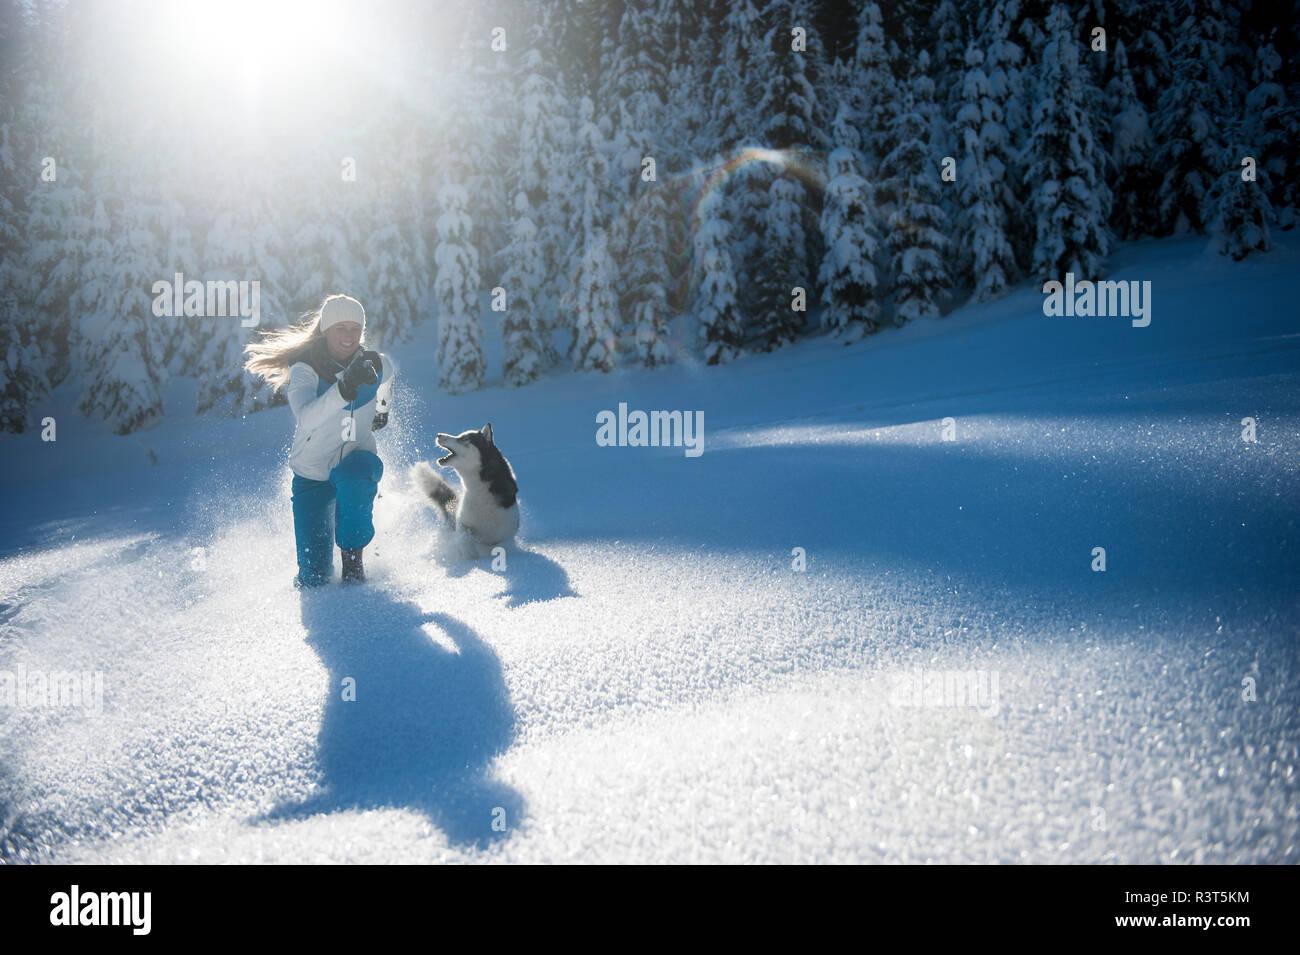 Austria, Altenmarkt-Zauchensee, happy young woman running with dog in snow - Stock Image